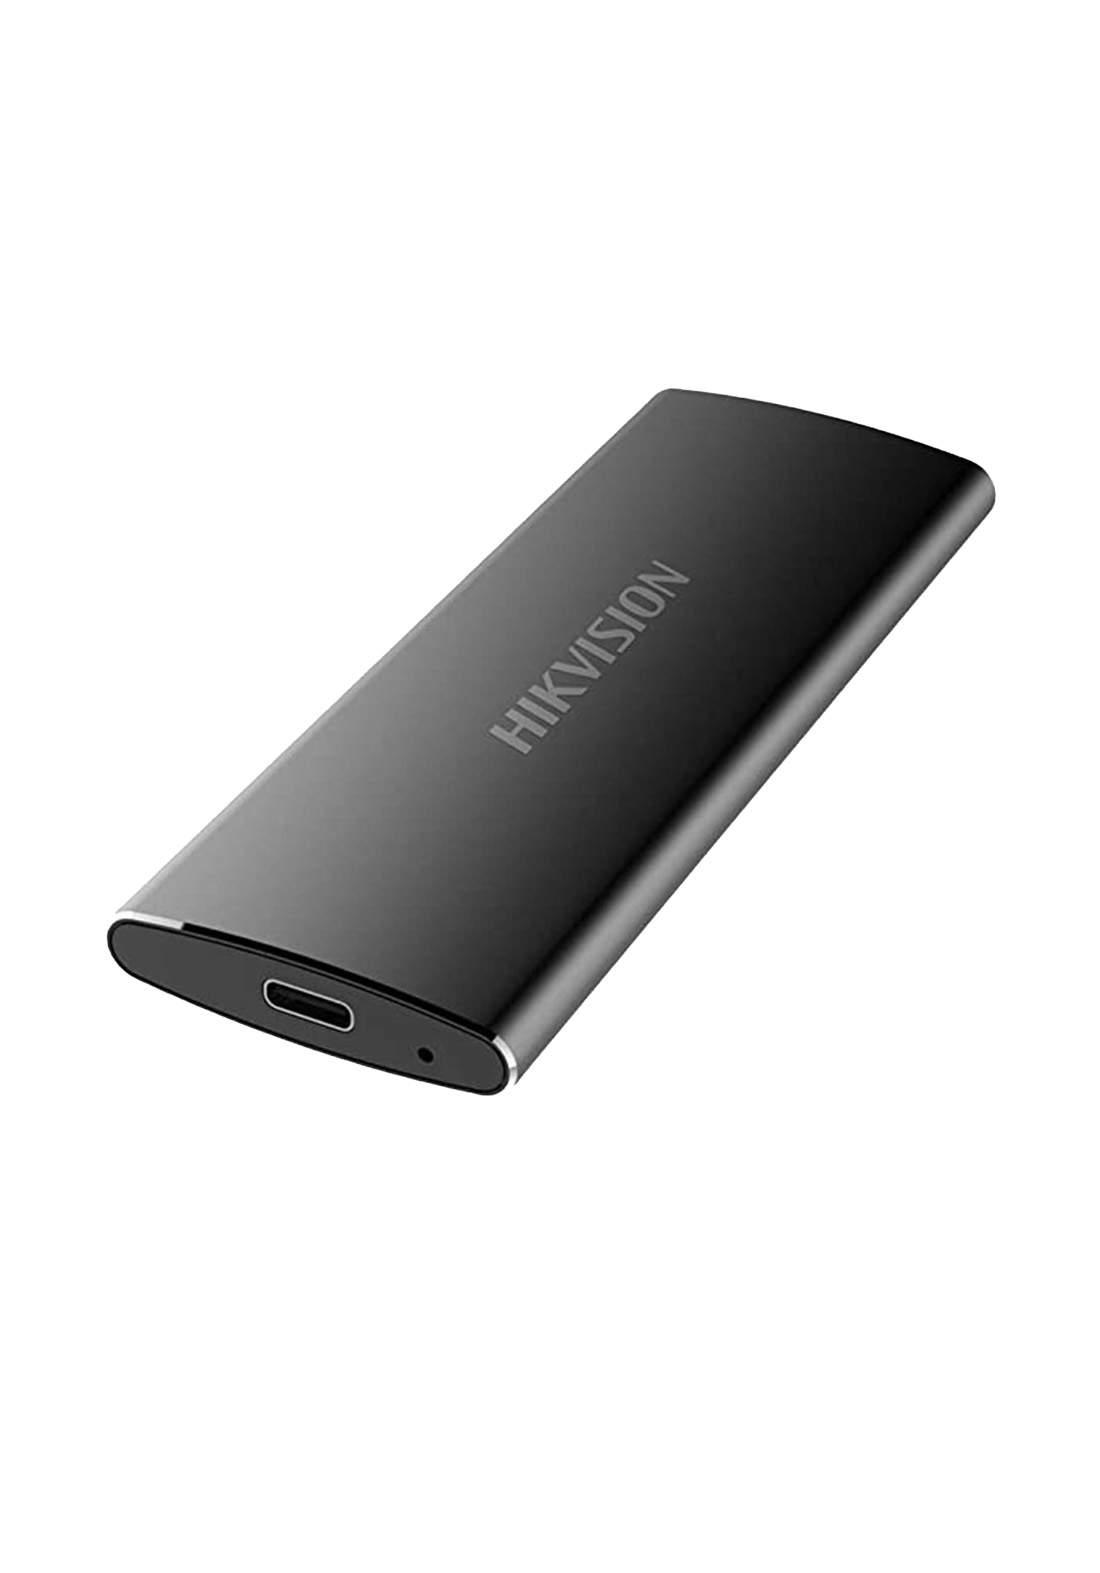 Hikvision T200N External SSD HS-ESSD 512GB - Black هارد خارجي